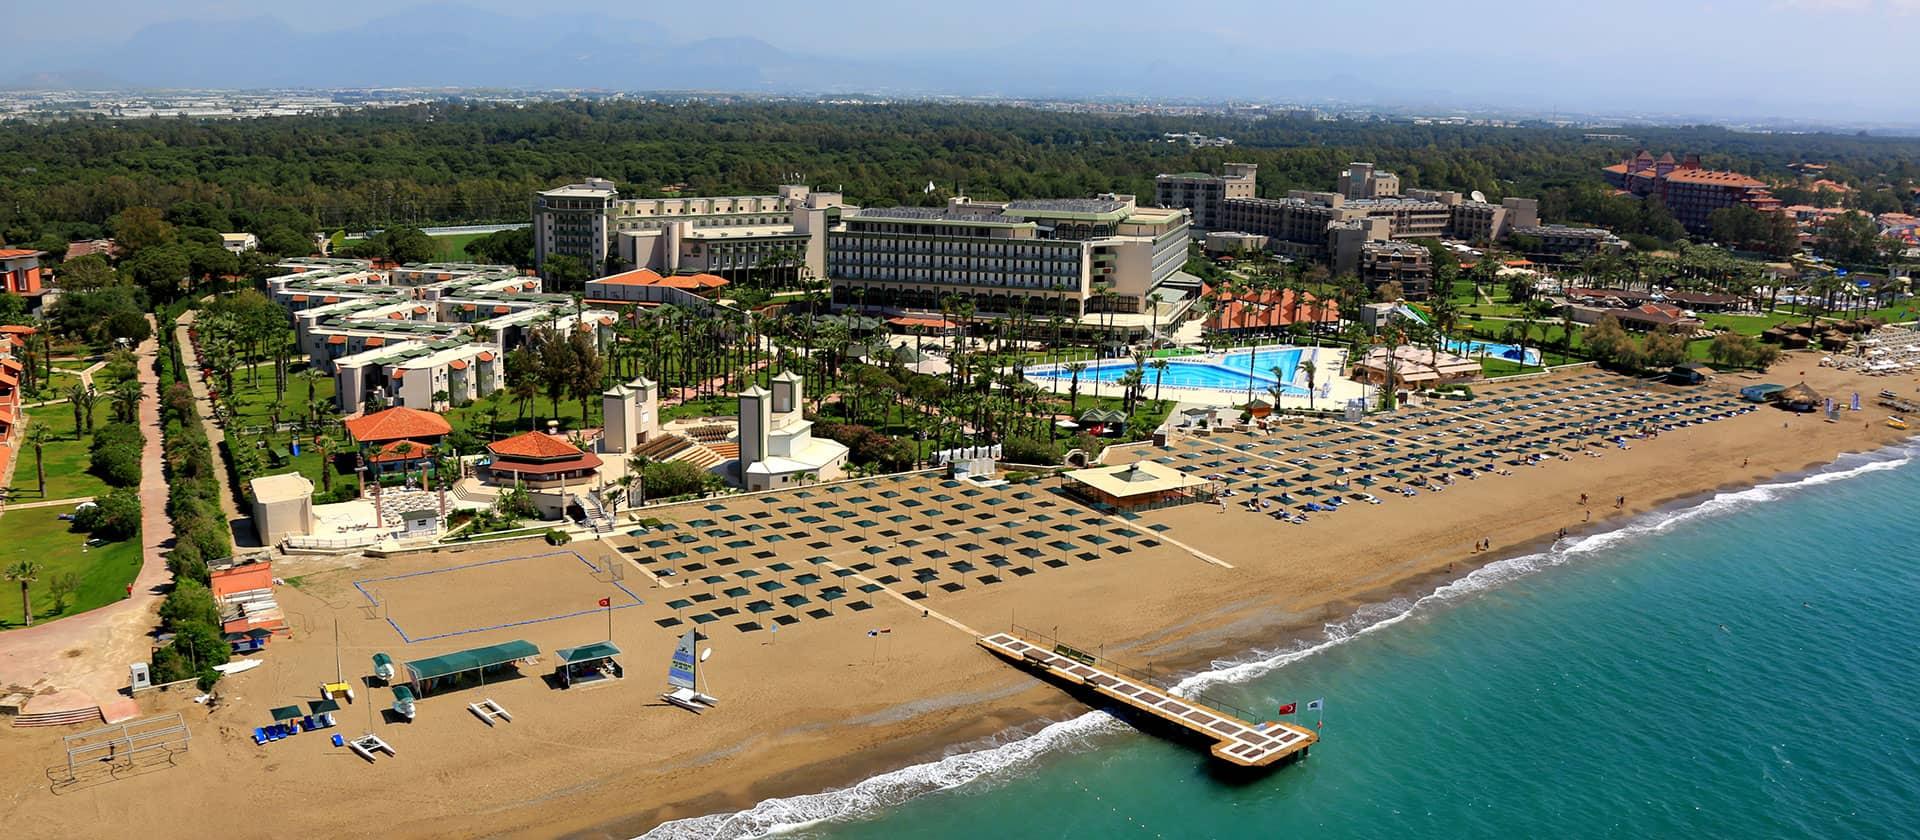 Adora Golf Resort 5* Belek, Turkey